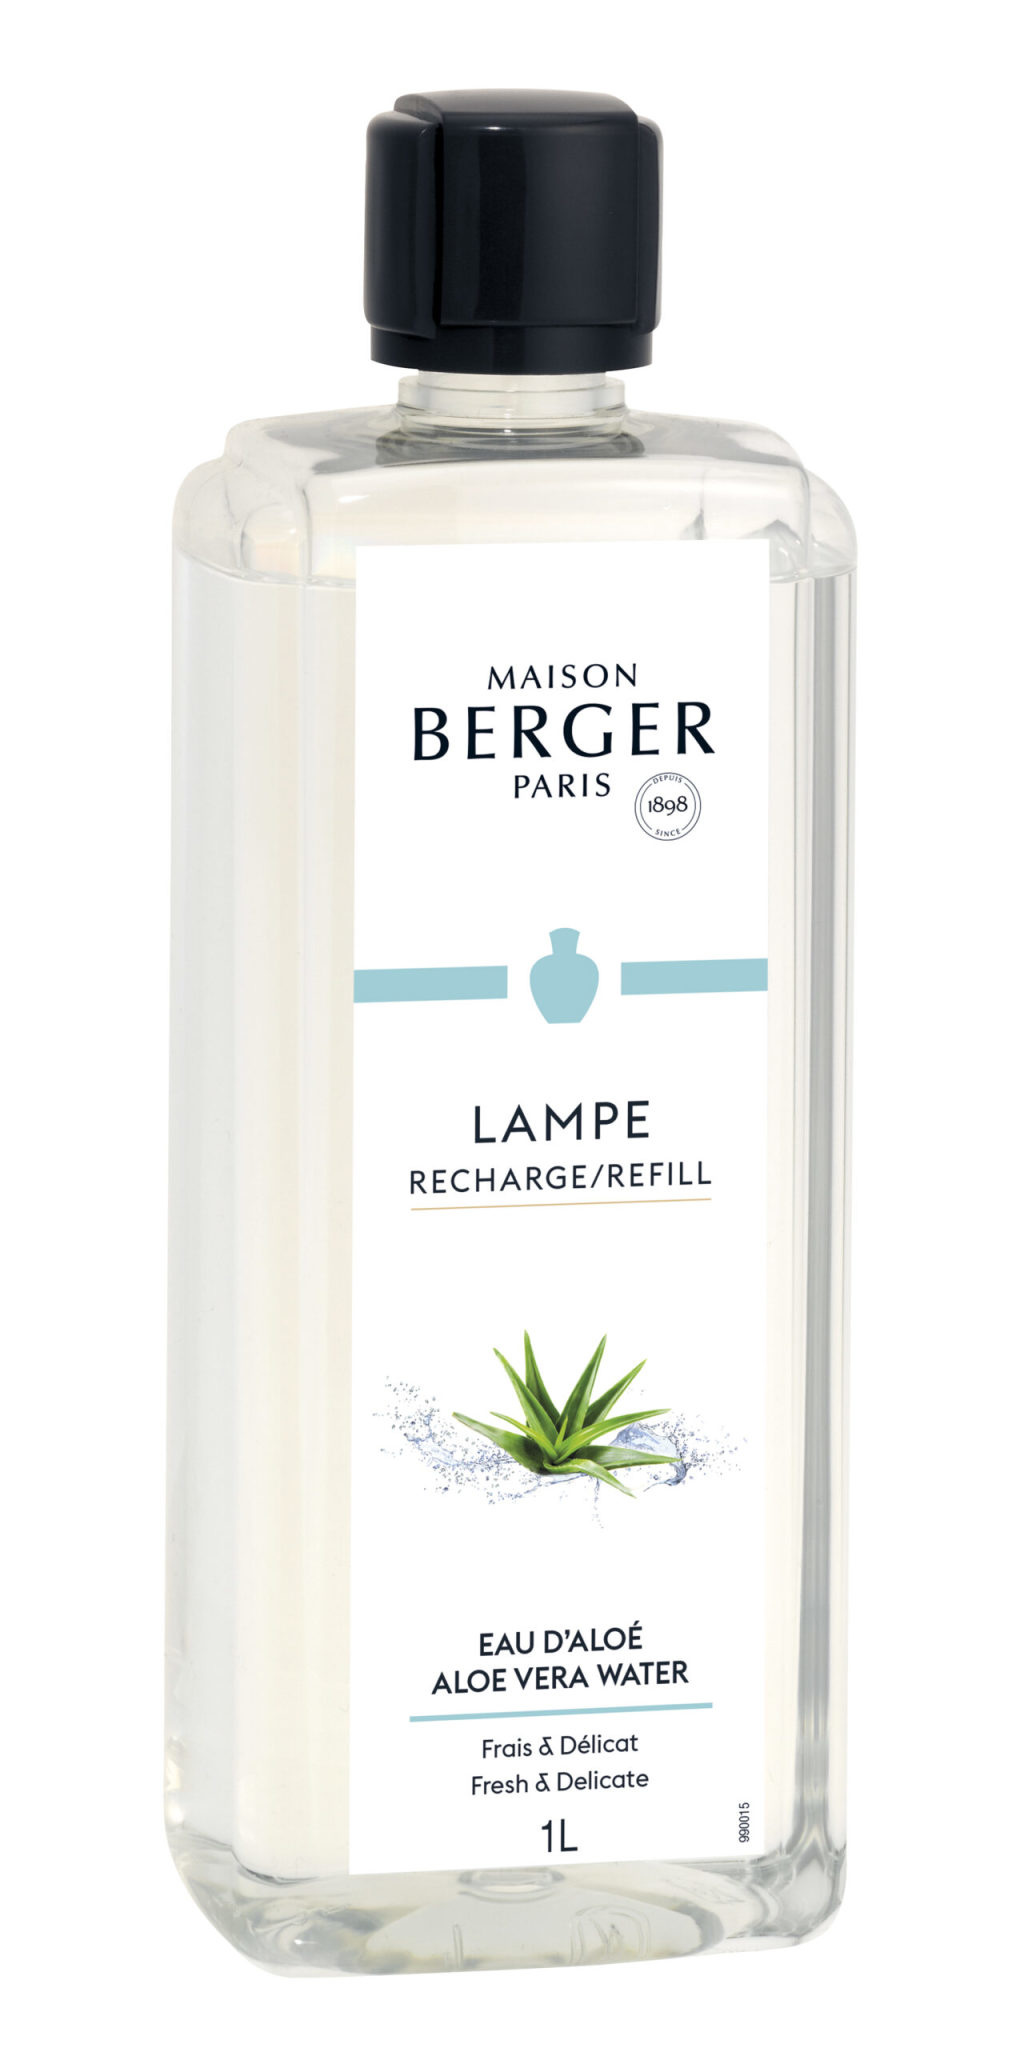 Lampe Berger Huisparfum Eau d' Vera 1L